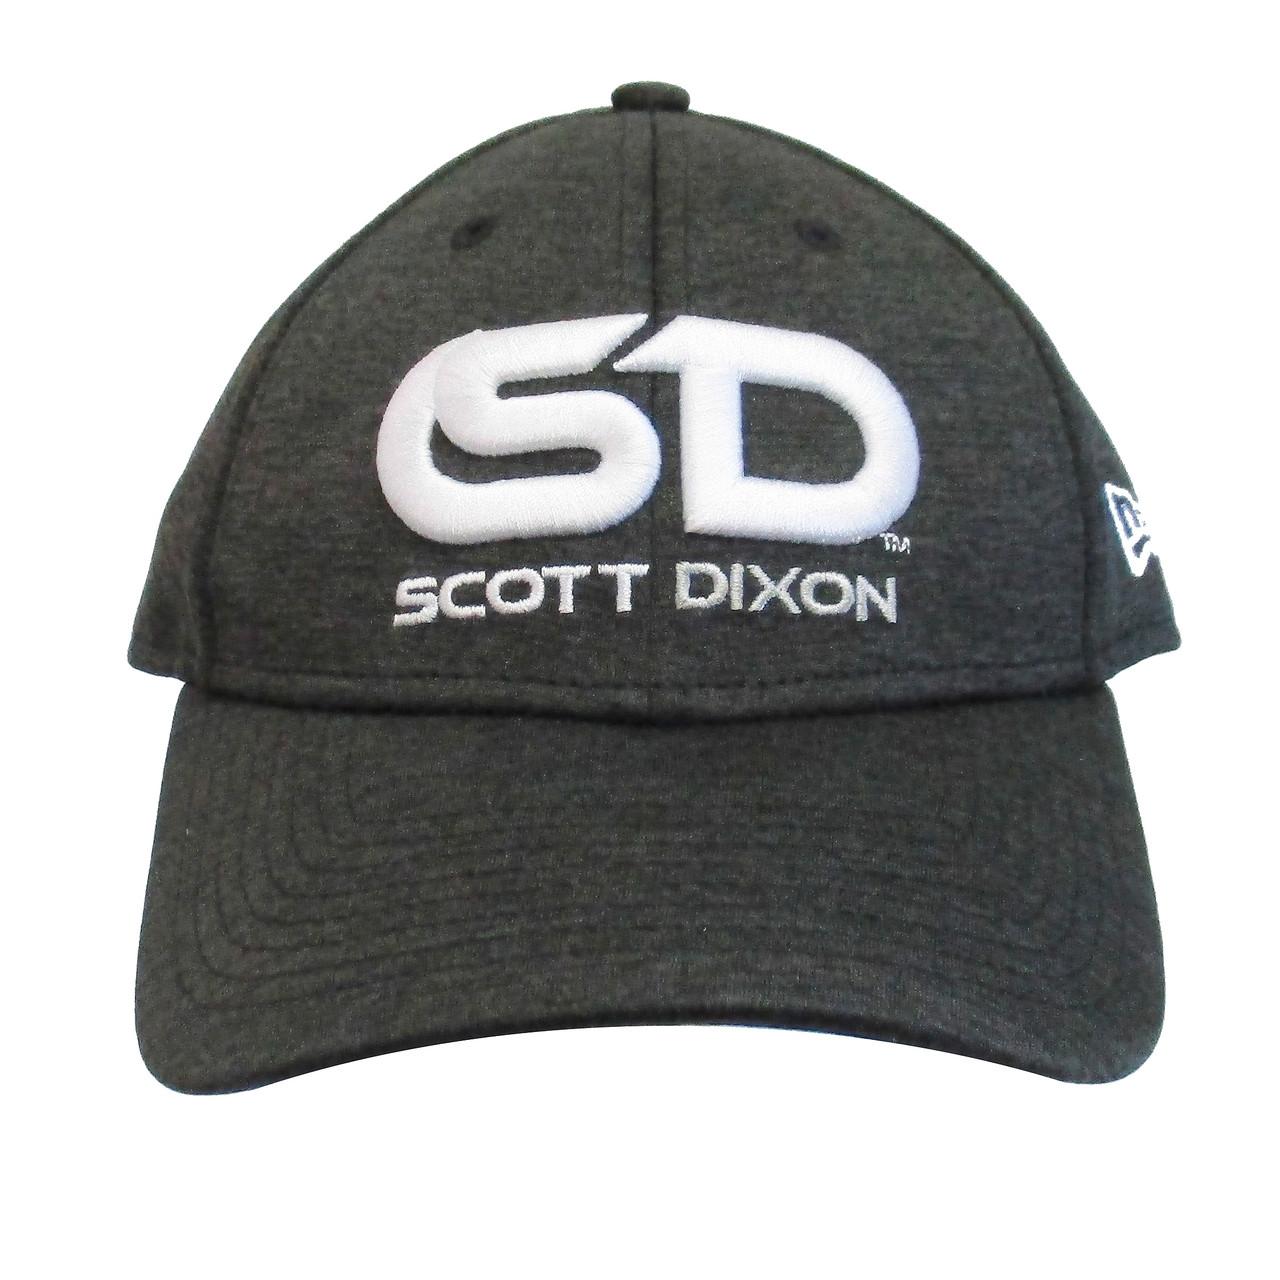 Scott Dixon Shadowtech Logo New Era 9 FORTY Cap - Indianapolis ... 388749fdeb5